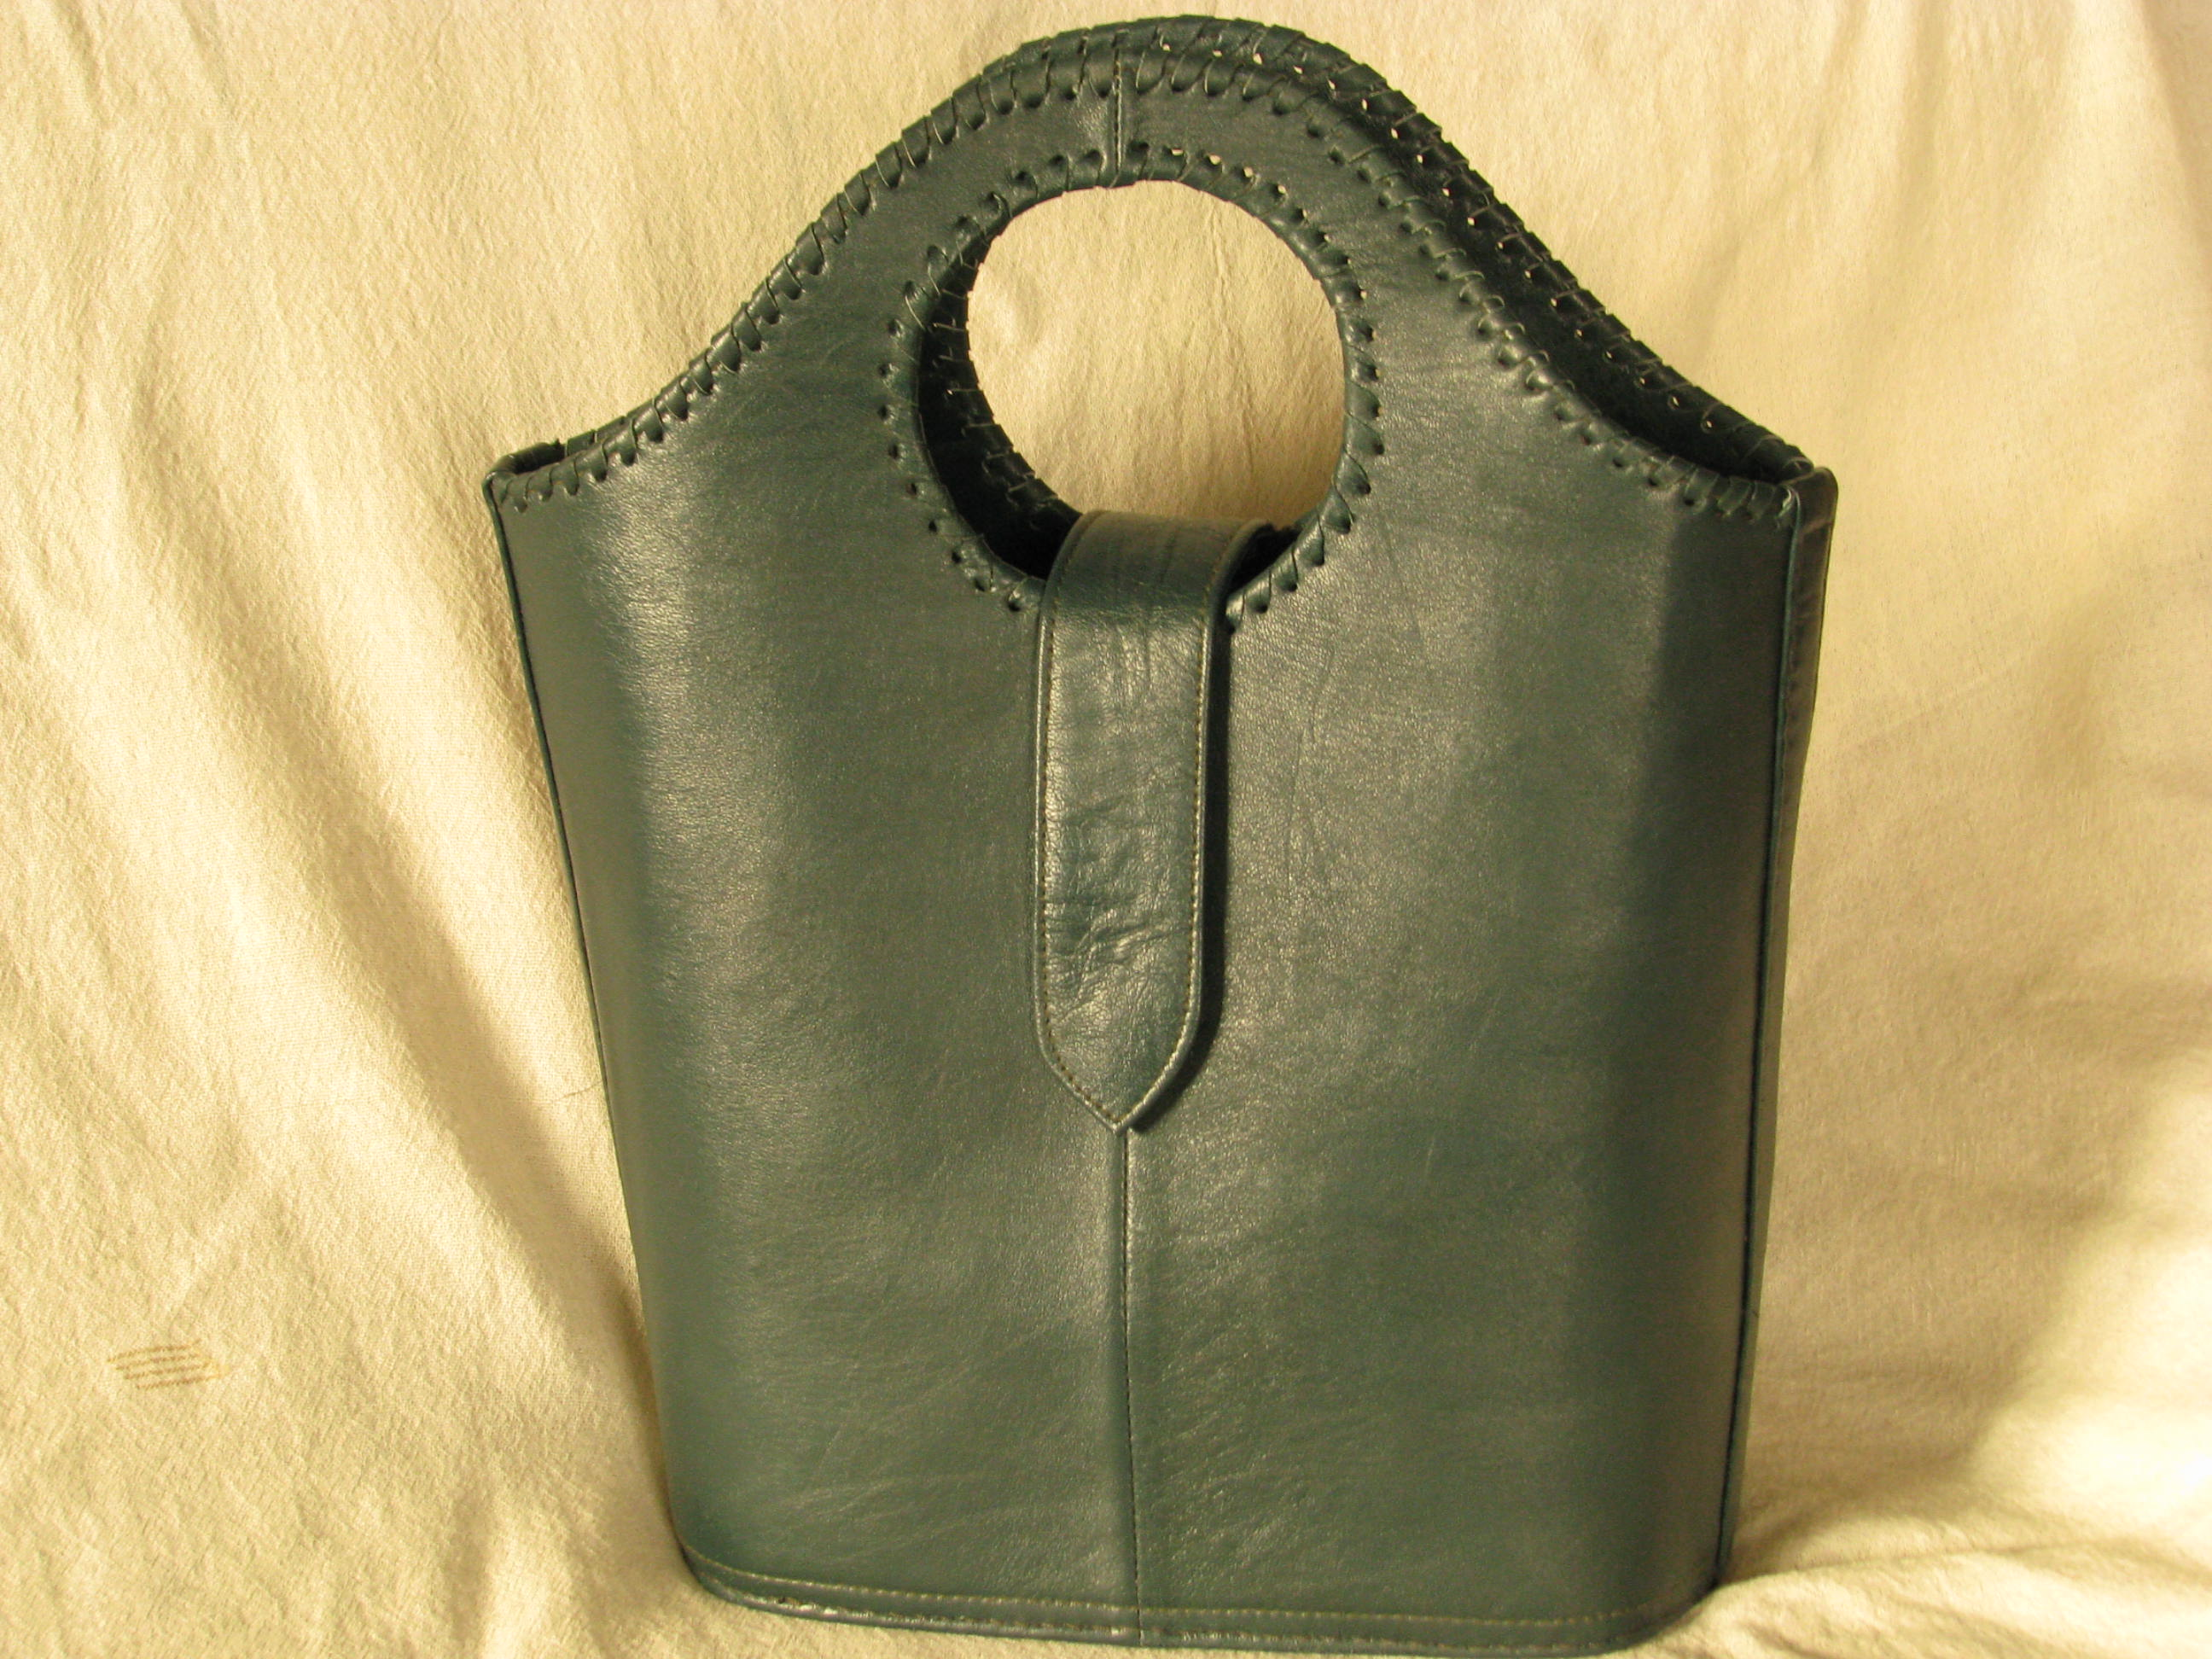 Gundara - shopper - dark-green - genuine leather - made in Afghanistan - fair trade